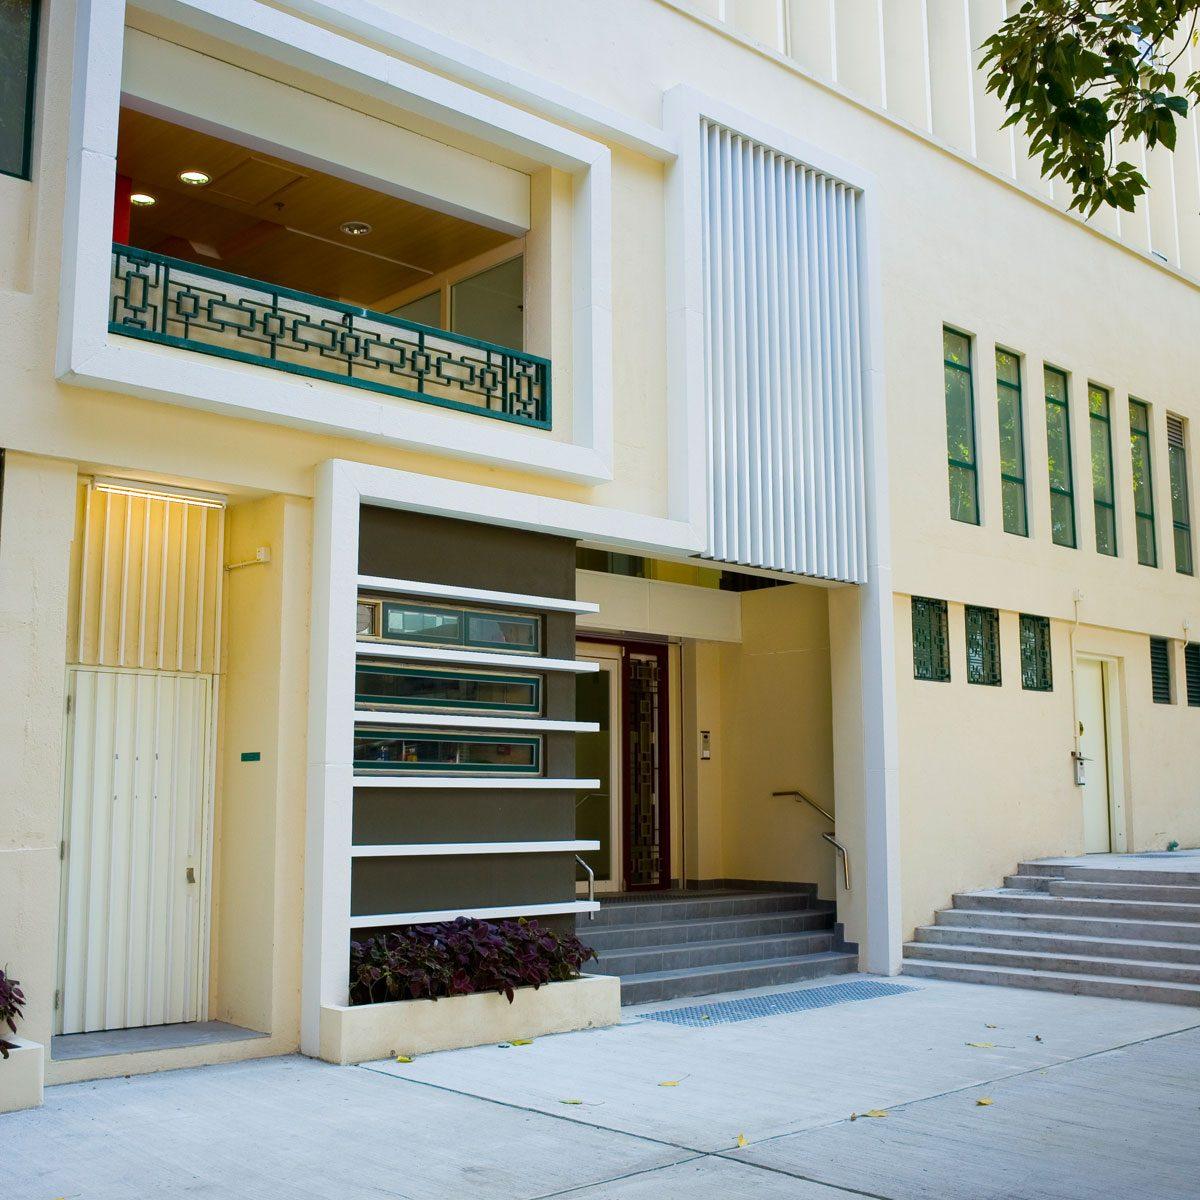 HKU Post-Graduate Residence at No.10 Ching Lin Terrace, Kennedy Town, Hong Kong